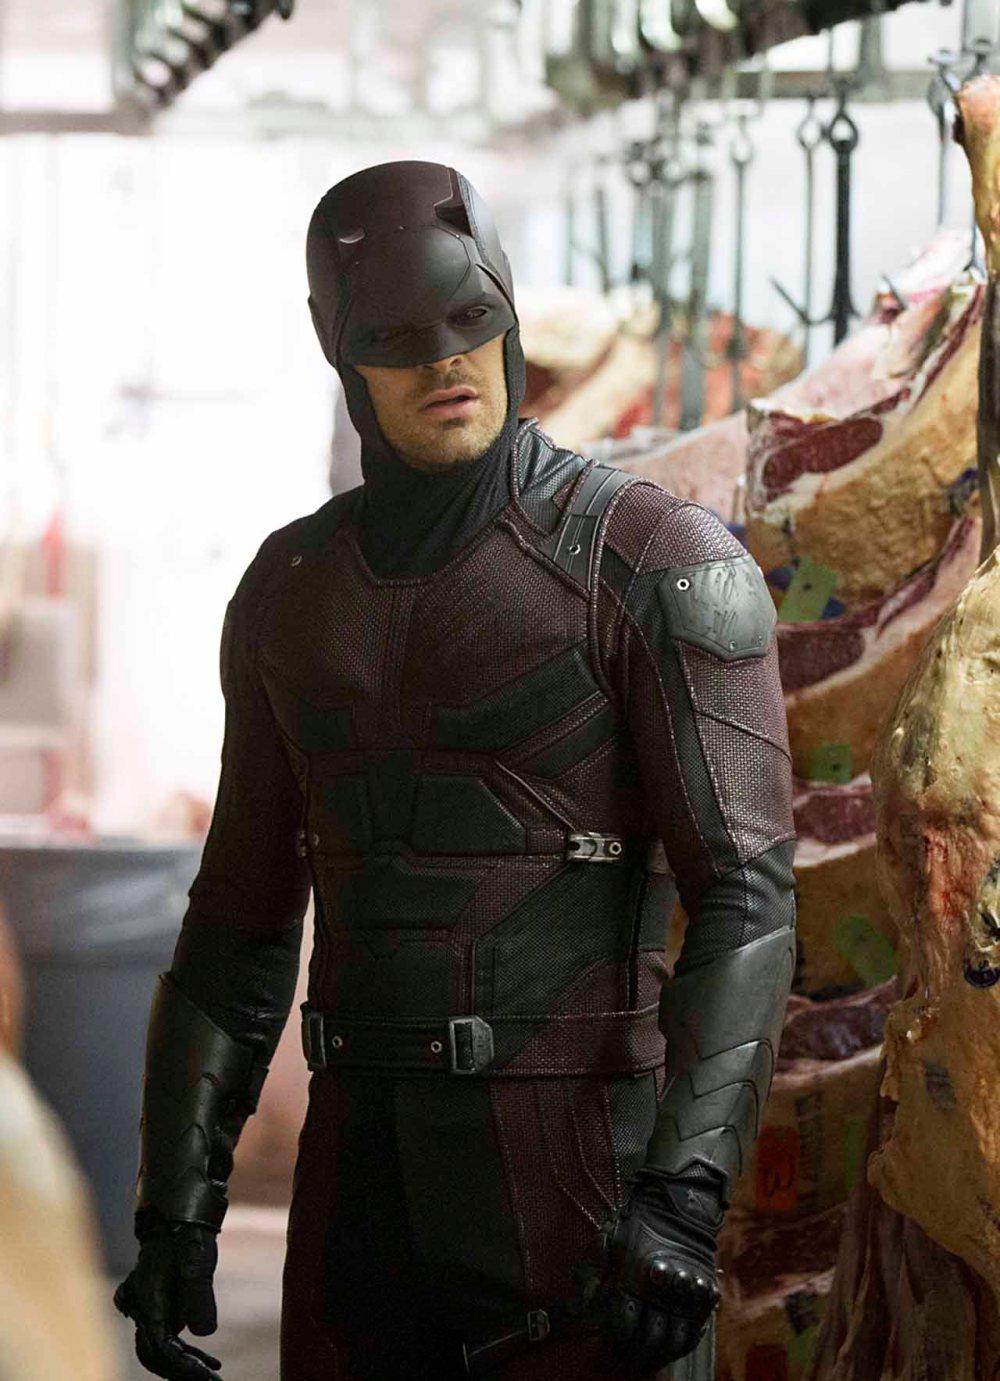 daredevil-season-2-costume-image